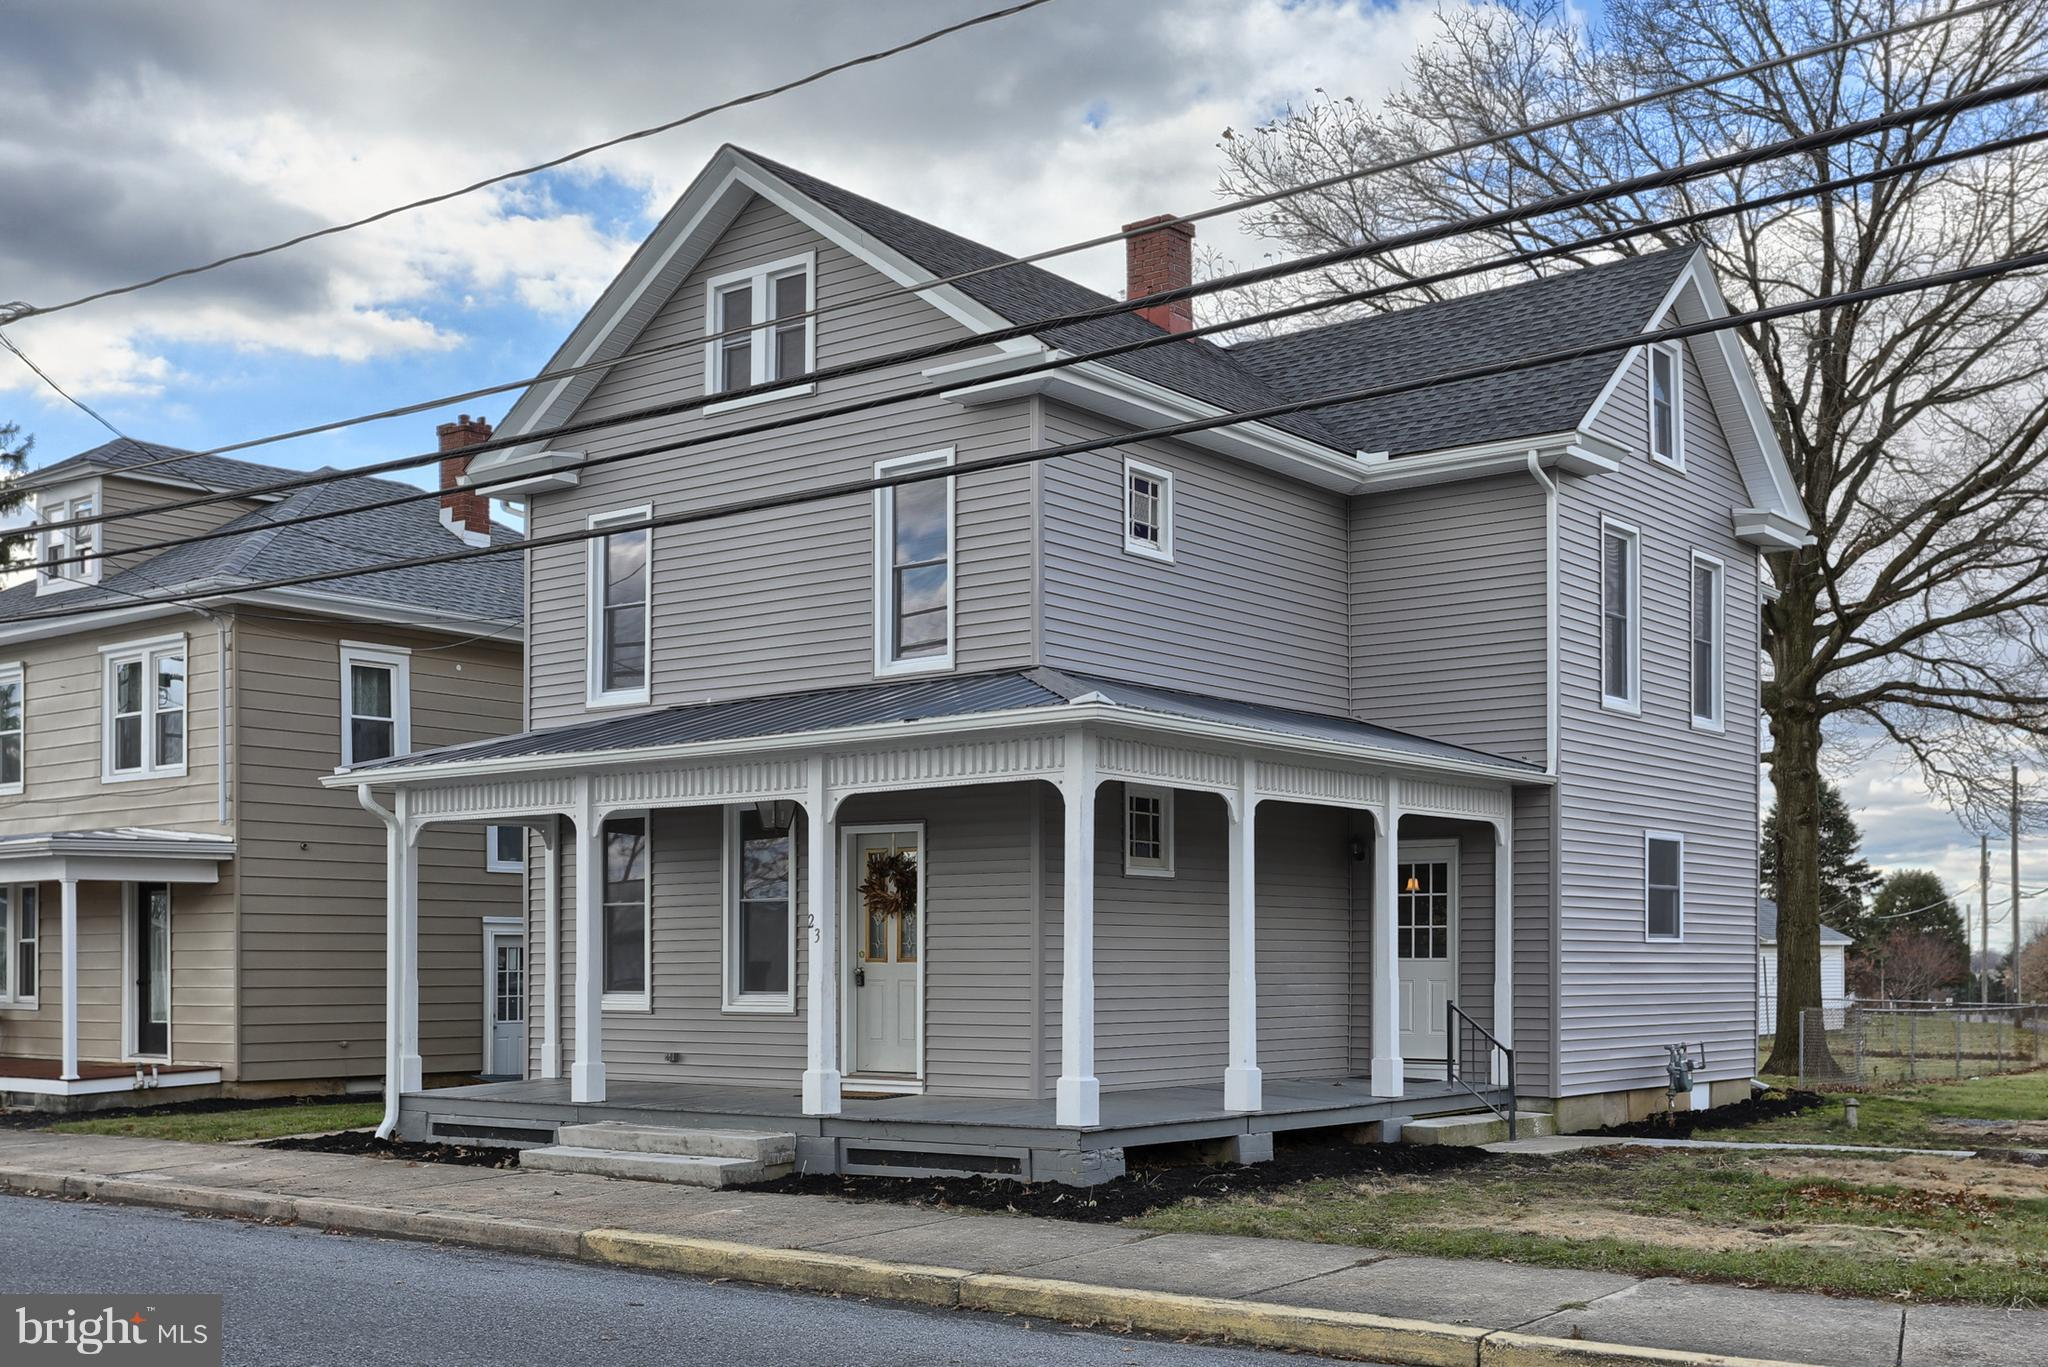 23 CHESTNUT STREET, RICHLAND, PA 17087